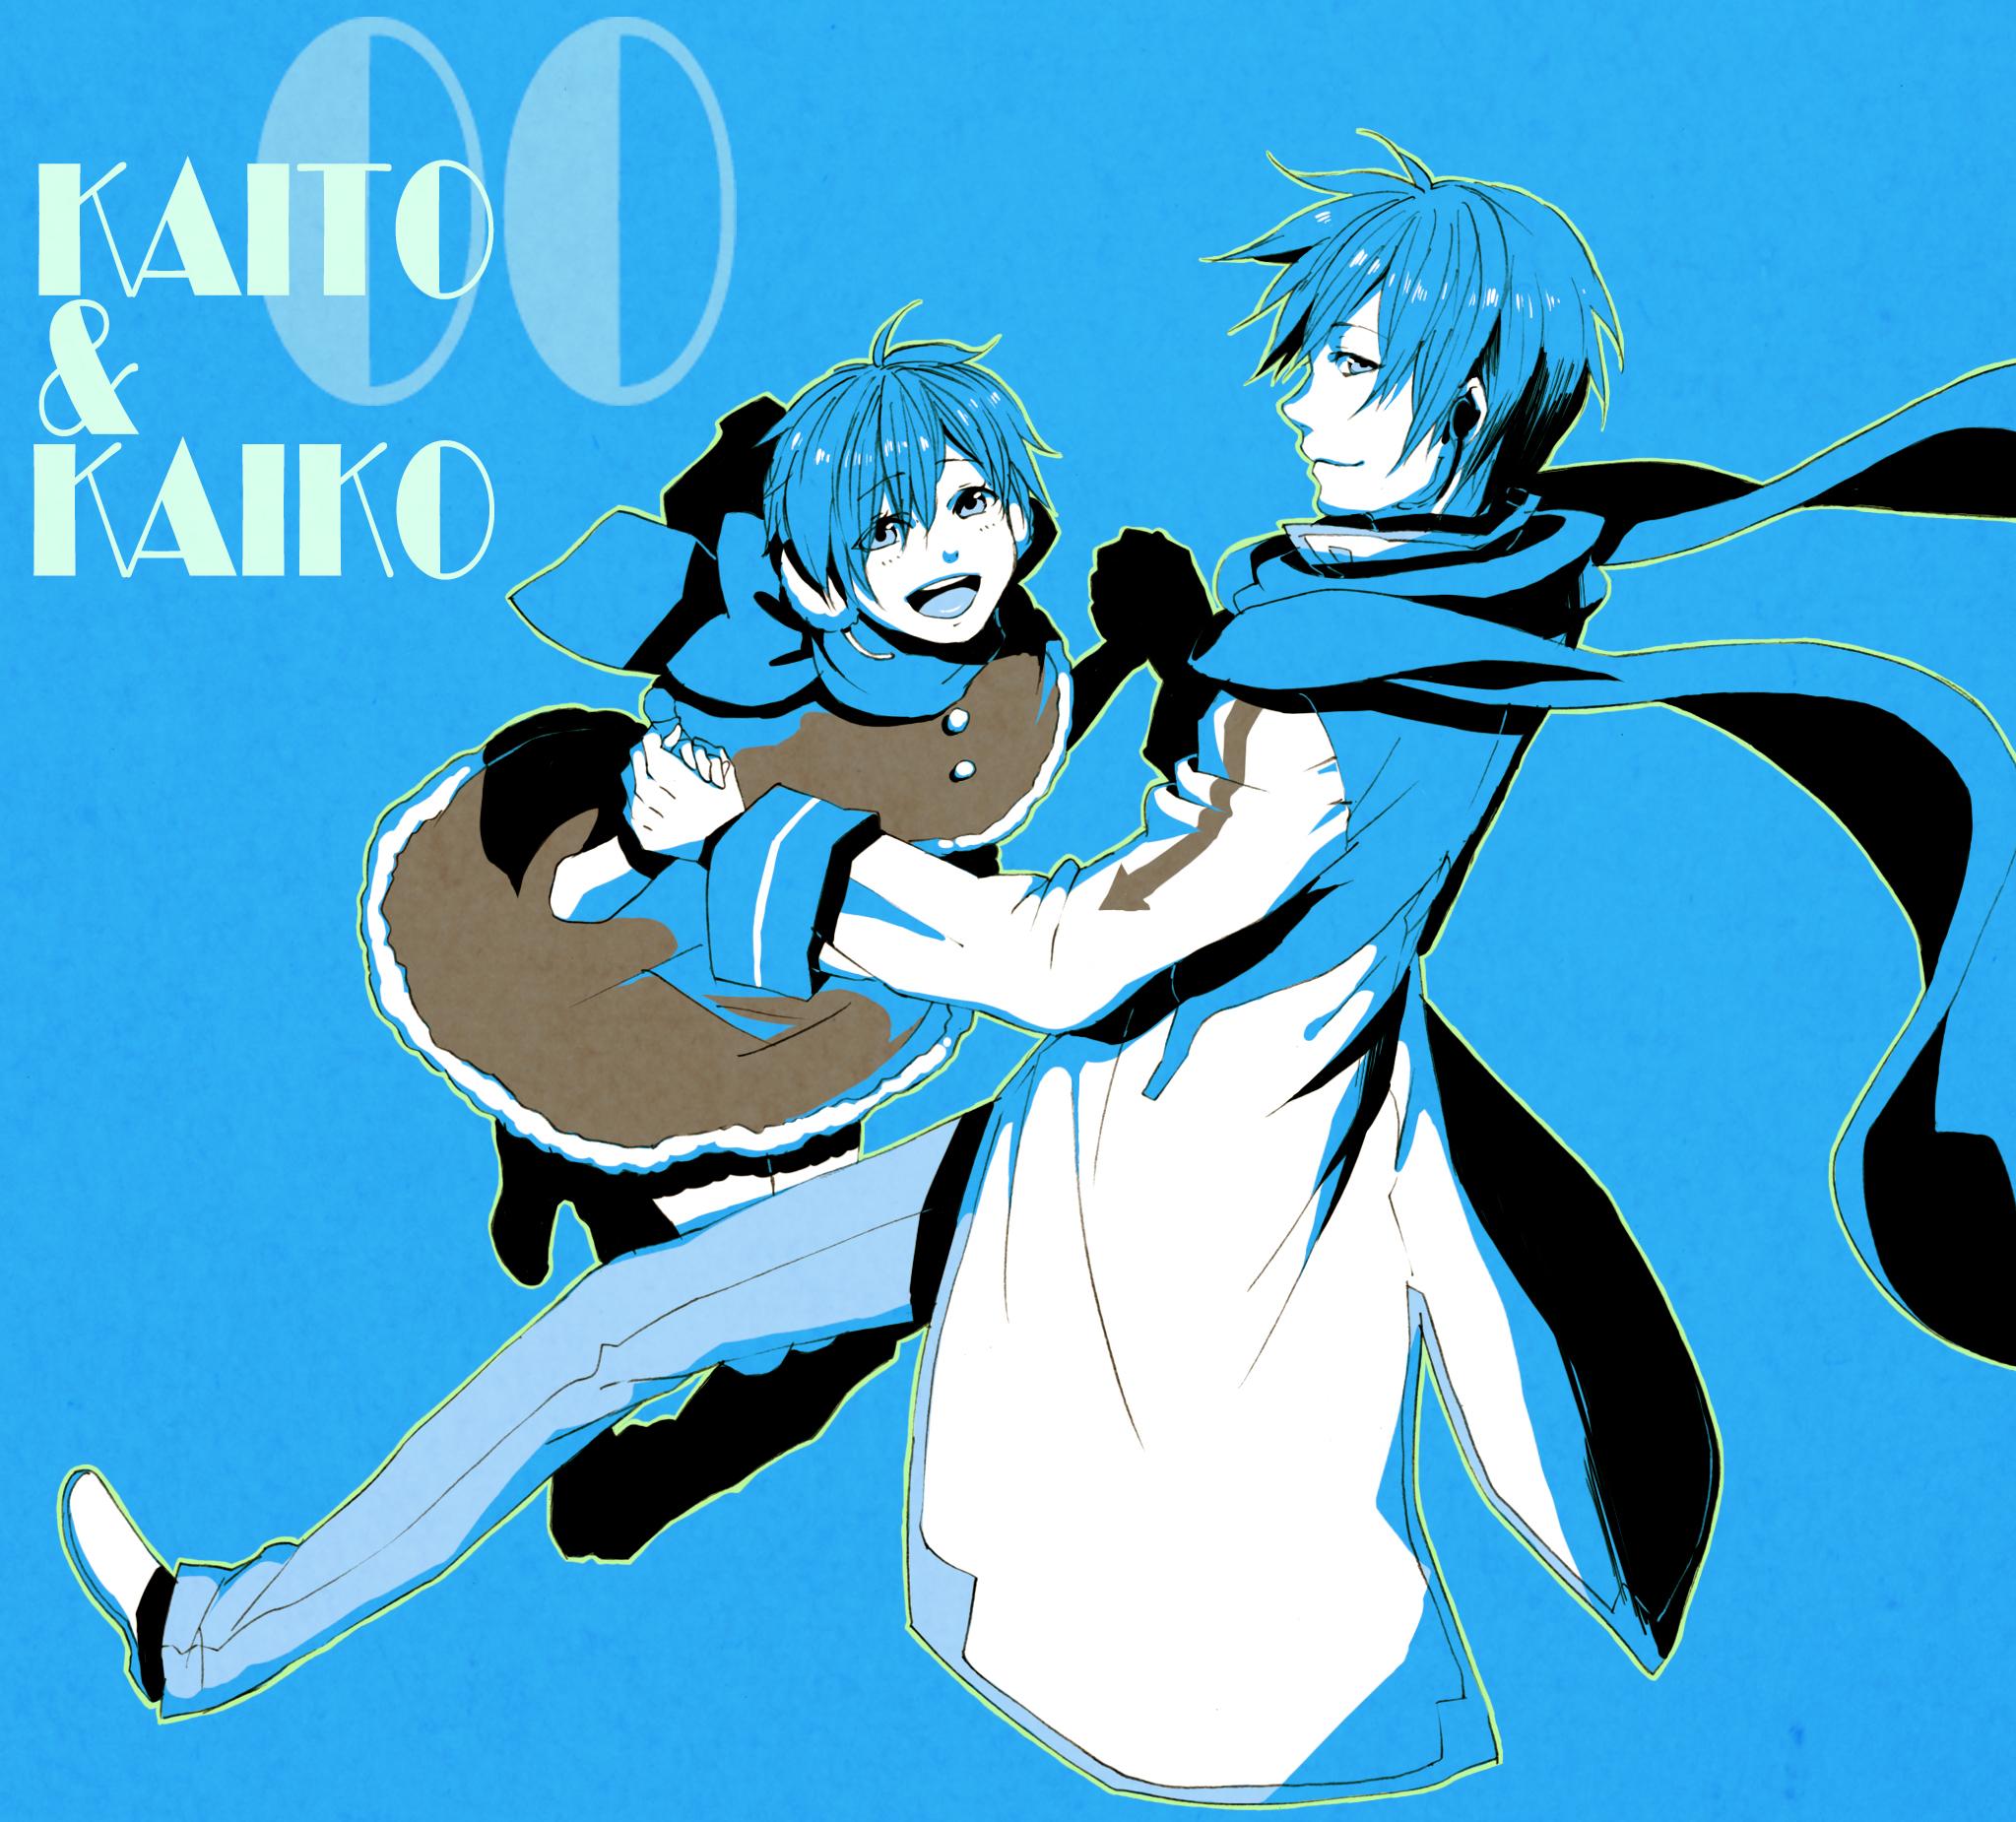 Kaito - Kaito Shion Photo (23488995) - Fanpop Vocaloid Kaito Wiki